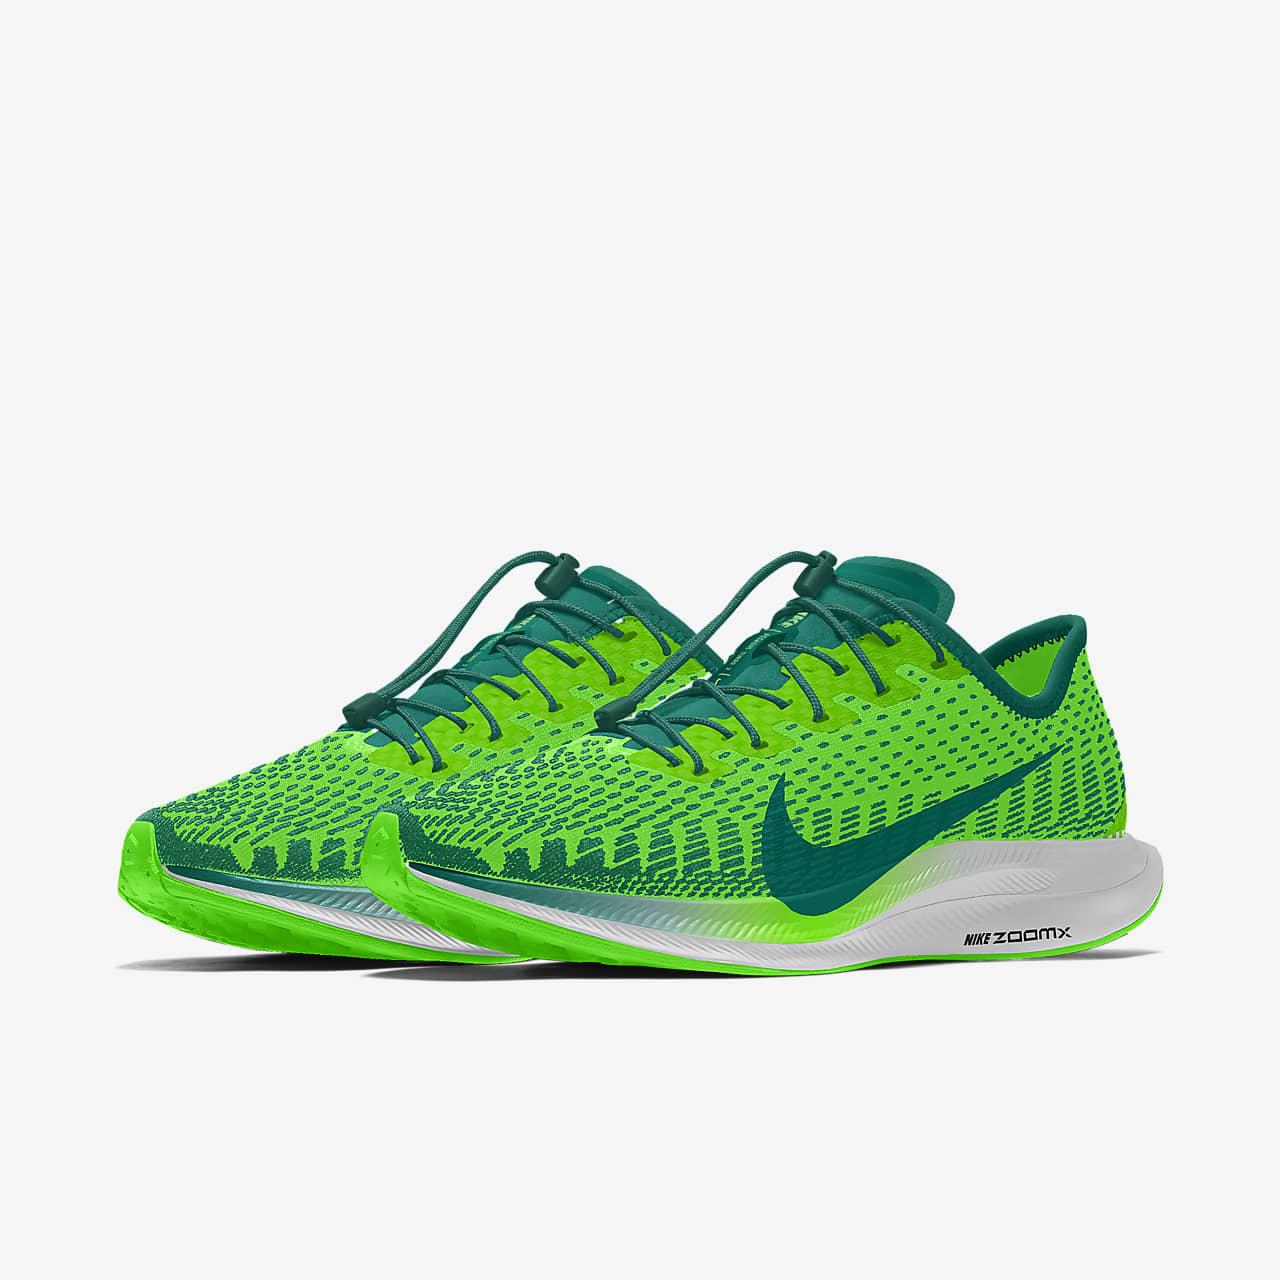 Similar Visible Polémico  Nike Zoom Pegasus Turbo 2 Premium By You Custom Men's Running Shoe. Nike SG